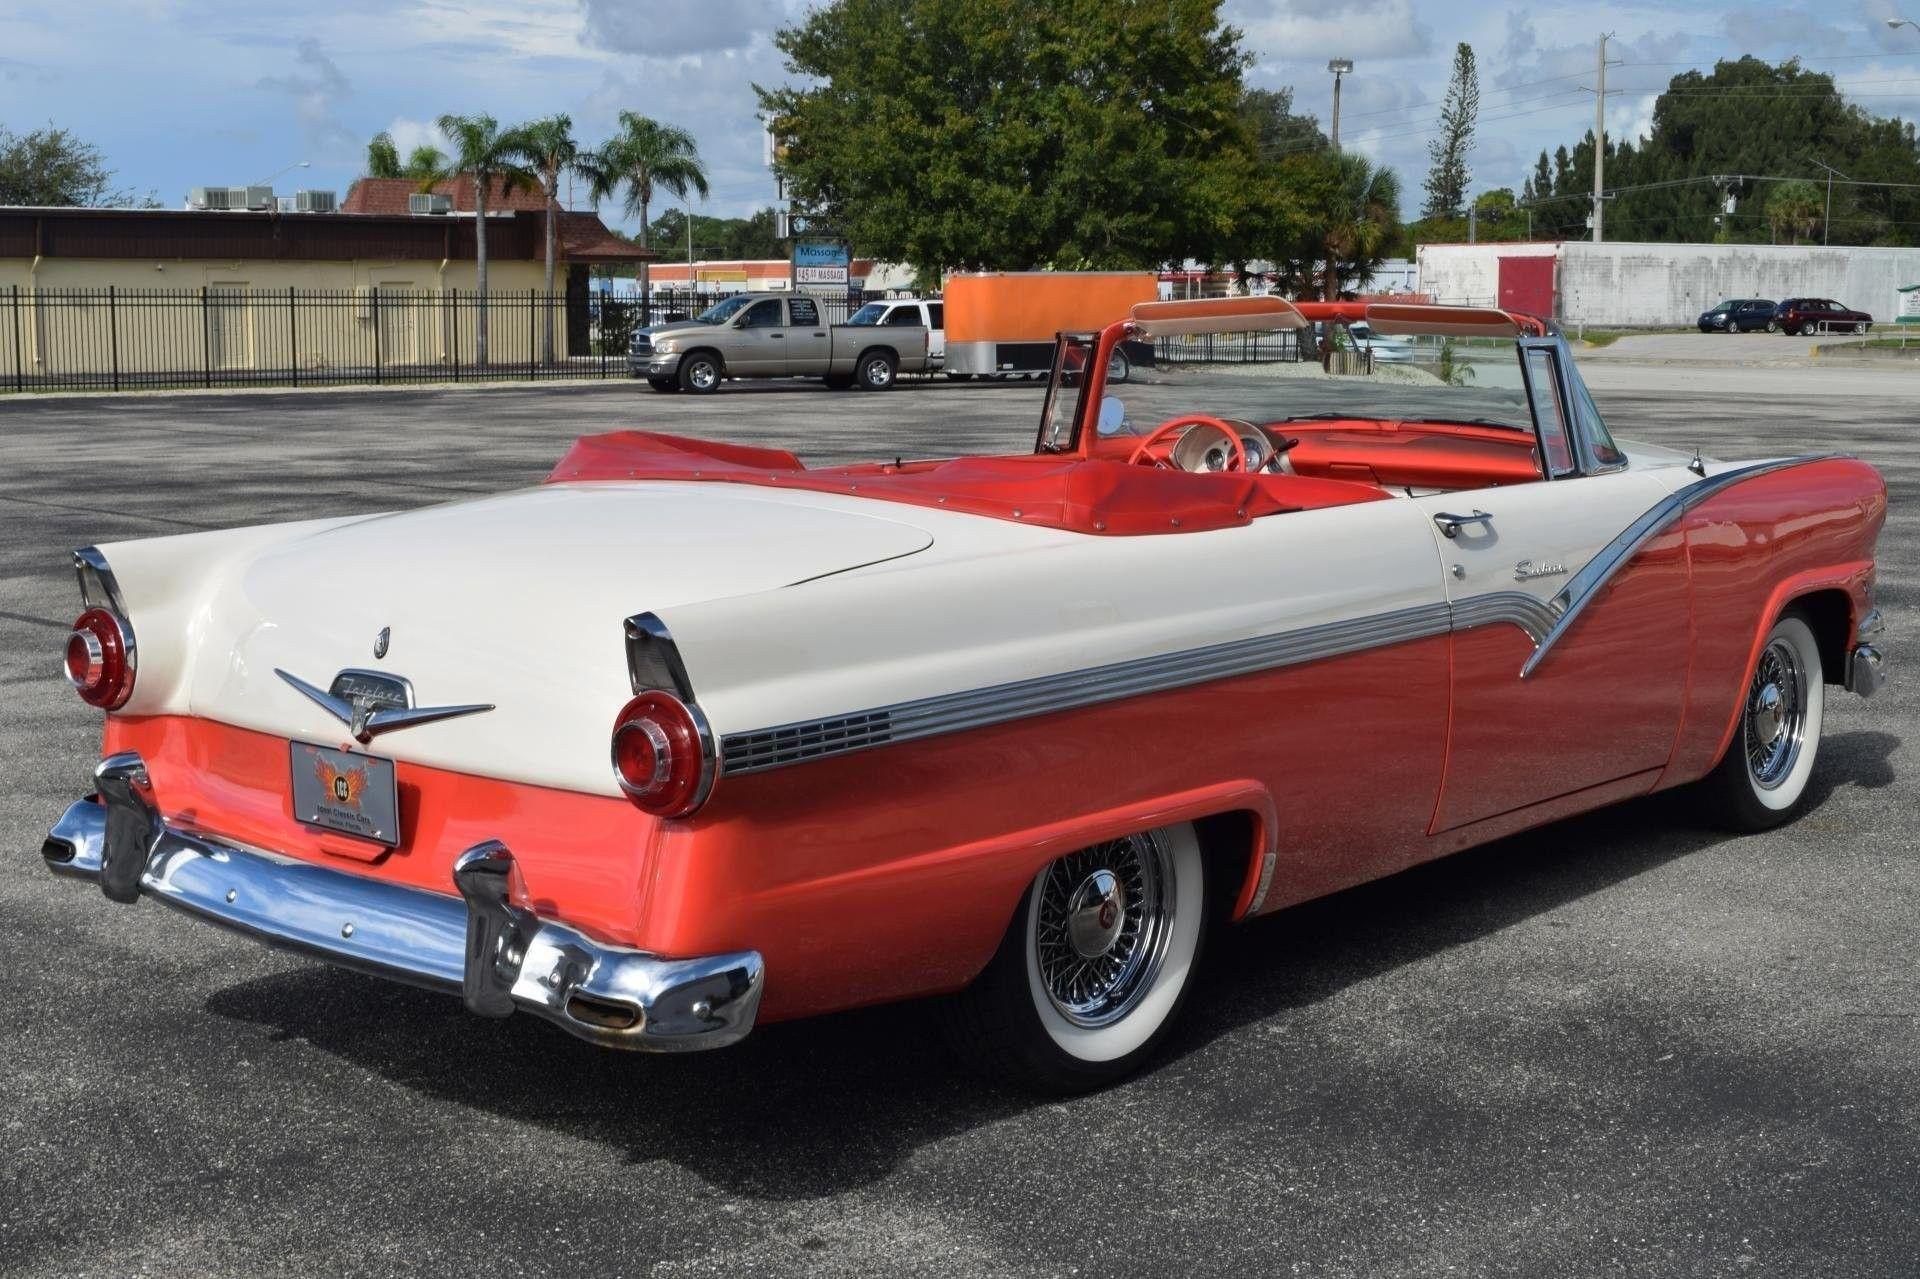 1956 Ford Fairlane Sunliner American Classic Cars Best Classic